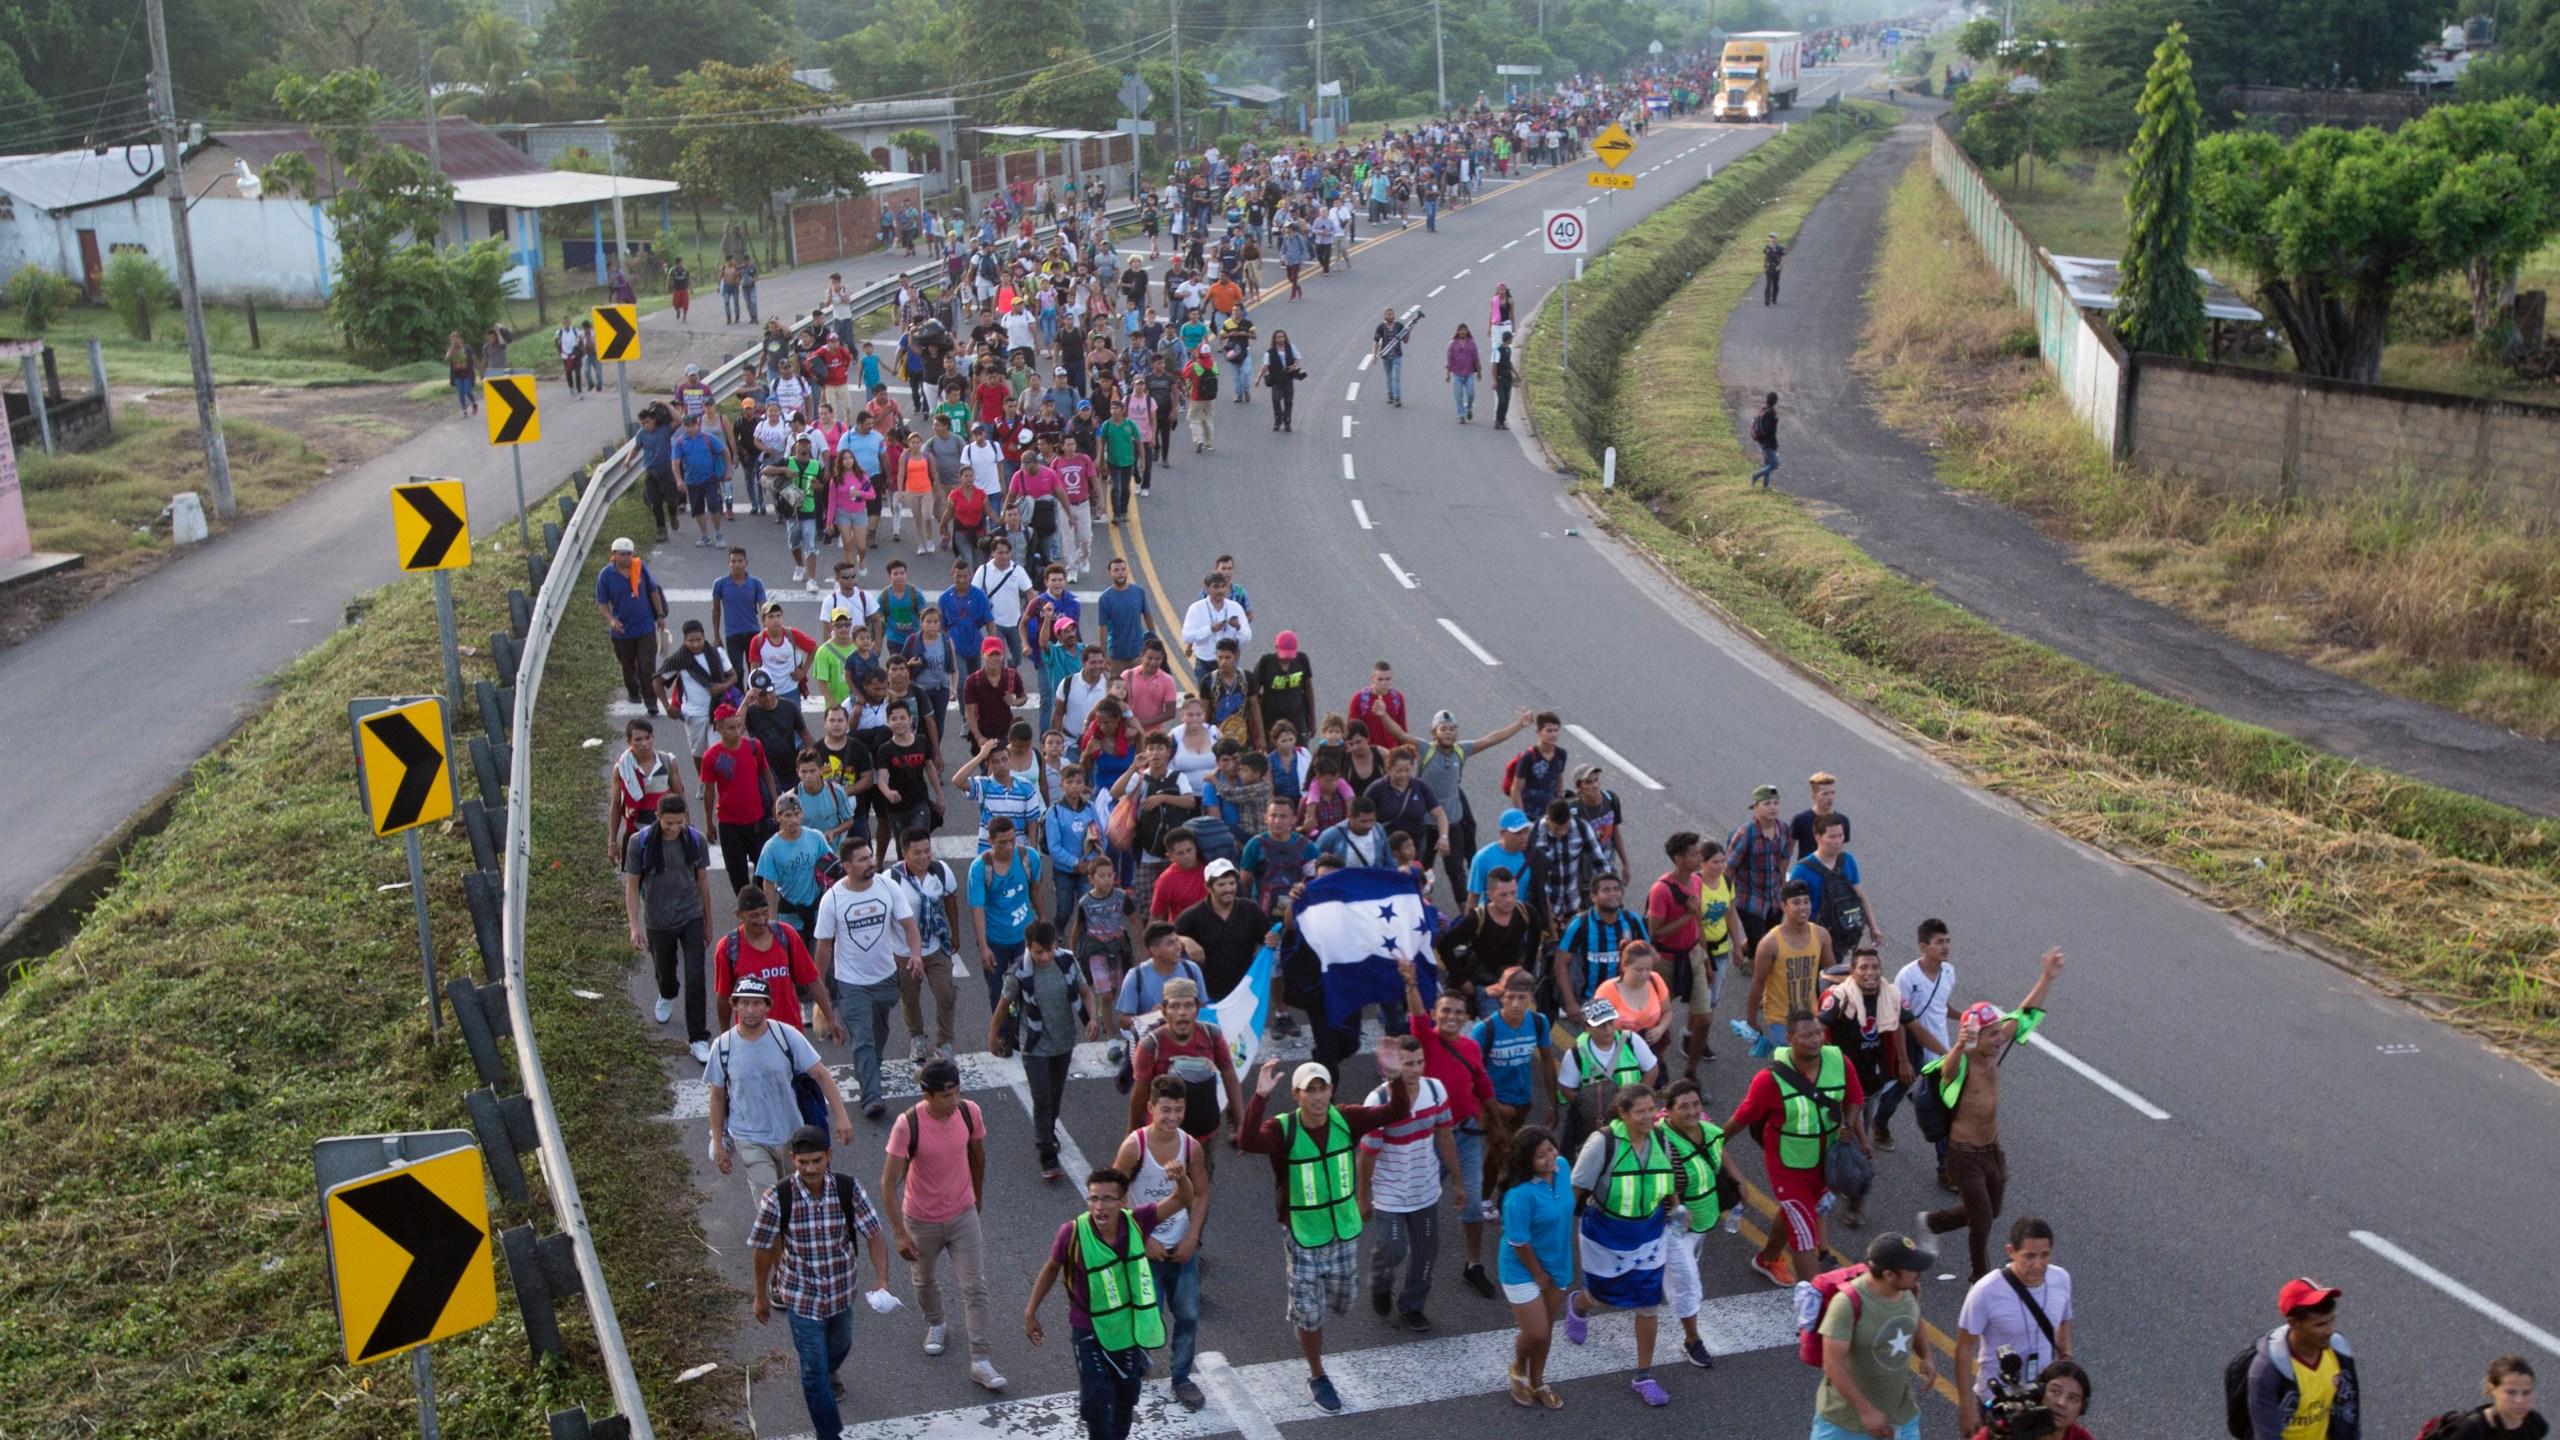 Central_America_Migrant_Caravan_72509-159532.jpg18993445